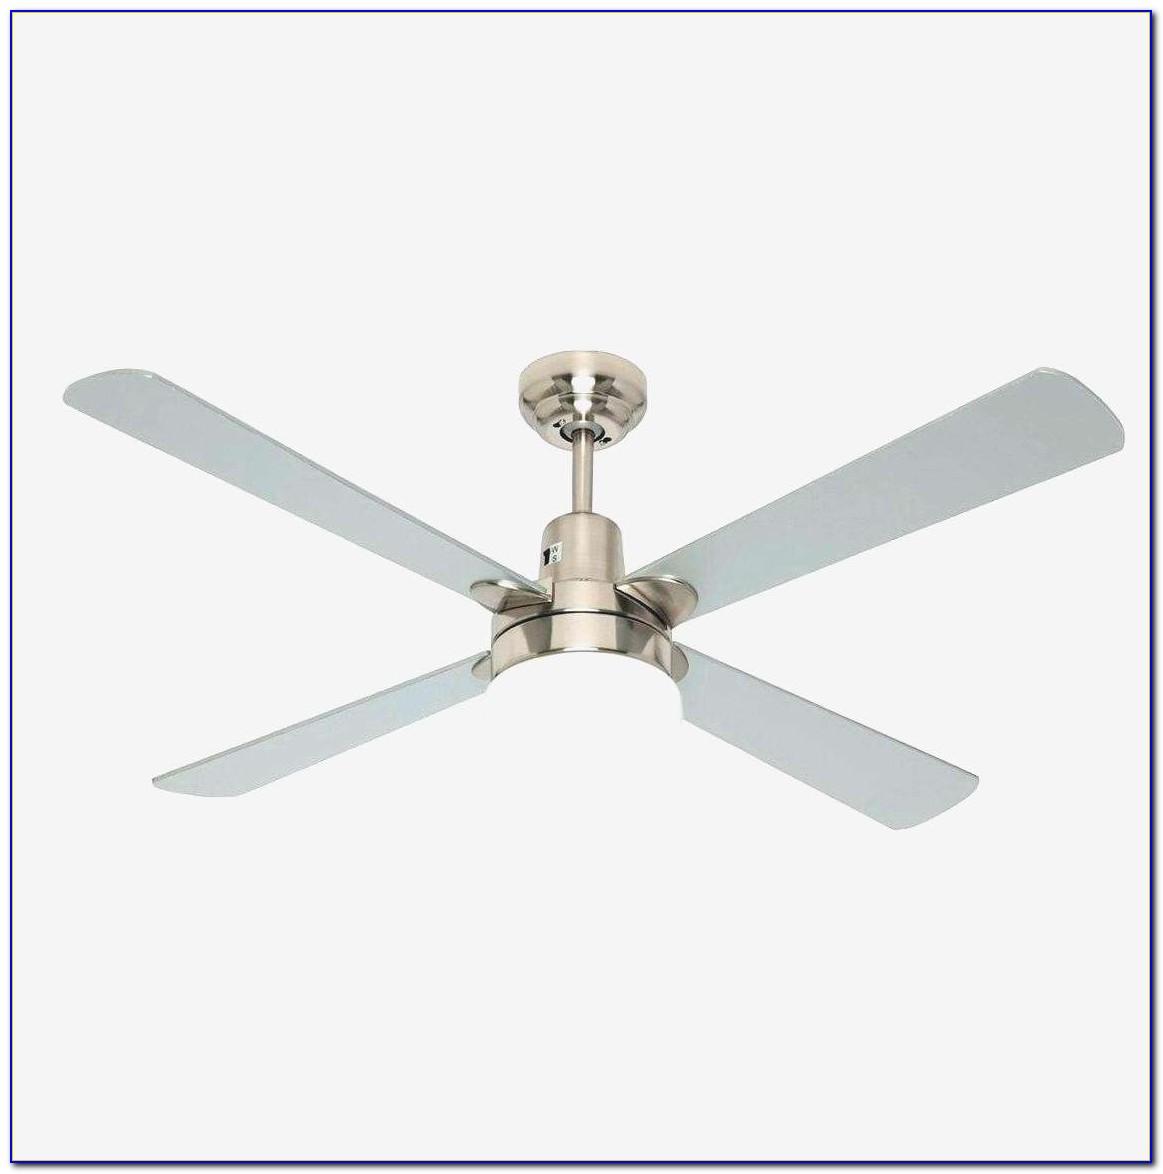 ceiling fan remote control kit wiring diagram white rodgers hampton bay